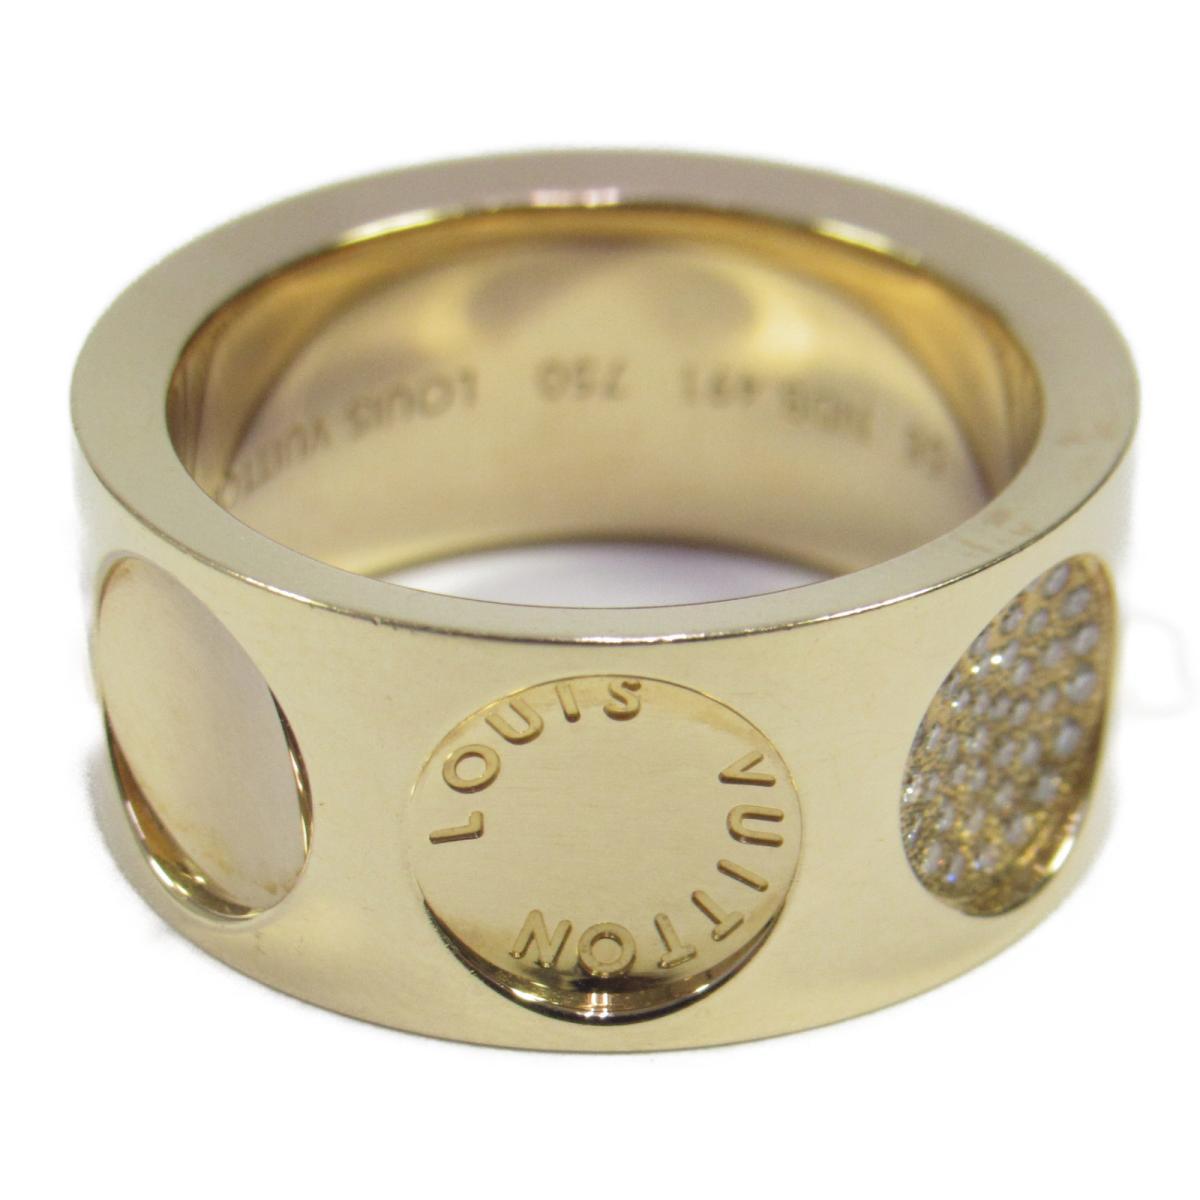 73a41a4034d5 Auth LOUIS VUITTON Petit Bague Empreinte Ring  58 18KYG Yellow Gold Diamond  Used